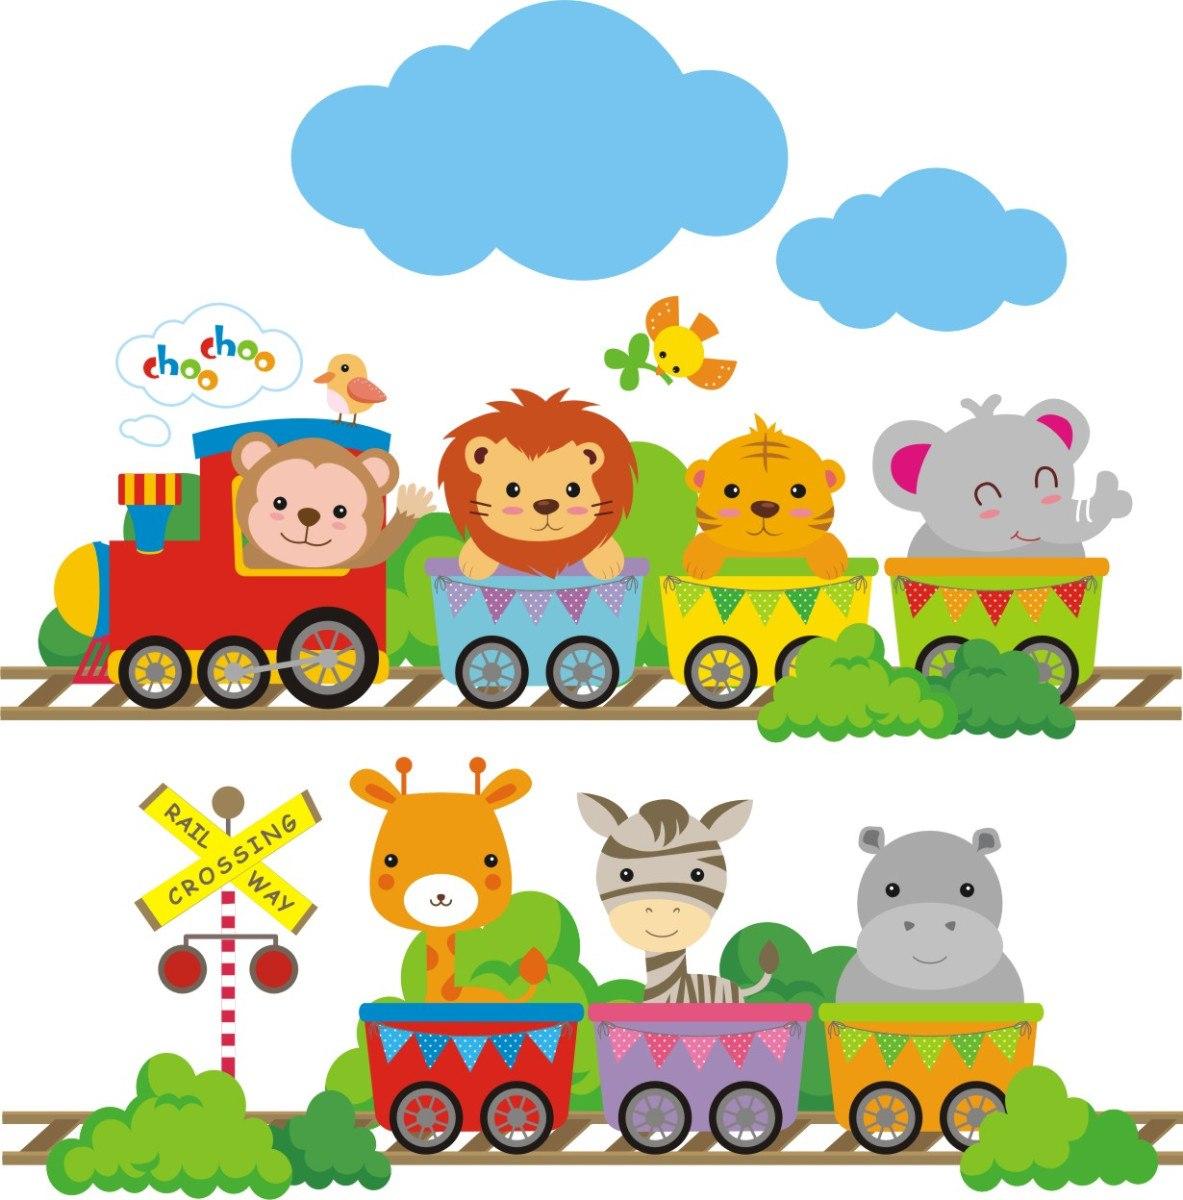 http://mlb-s1-p.mlstatic.com/adesivo-decorativo-parede-safari-infantil-bebe-zoo-trenzinho-11188-MLB20039259546_012014-F.jpg